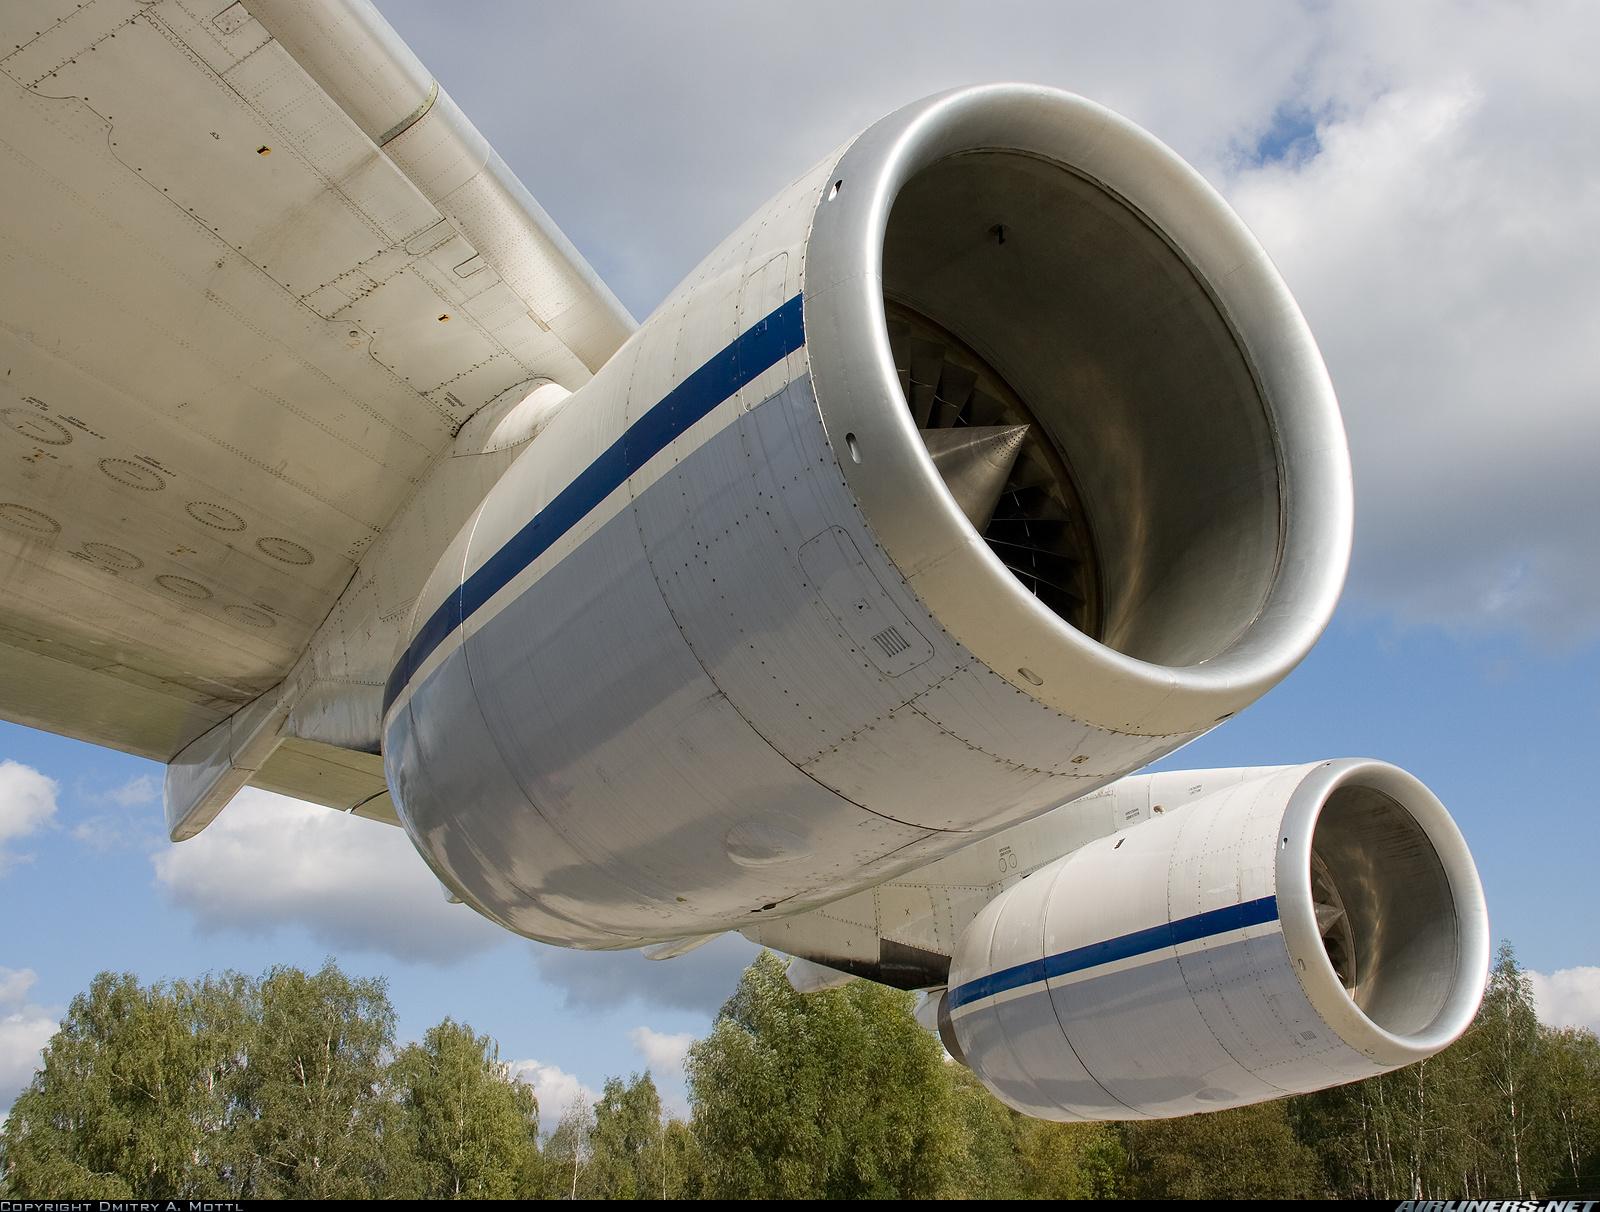 Двигатели Д-18 под крылом Ан-124